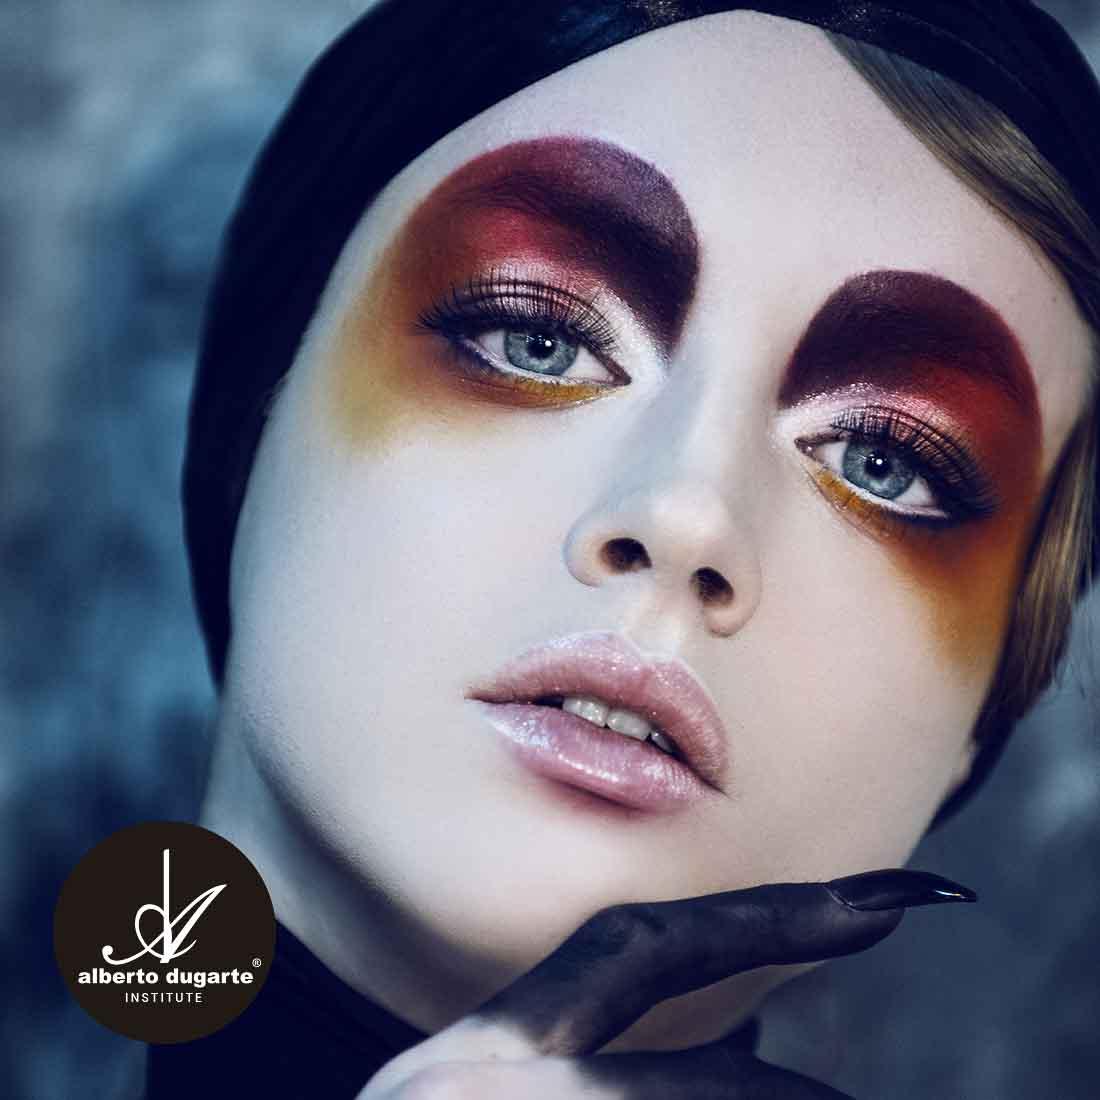 Curso maquillaje madrid examen (32 de 34)